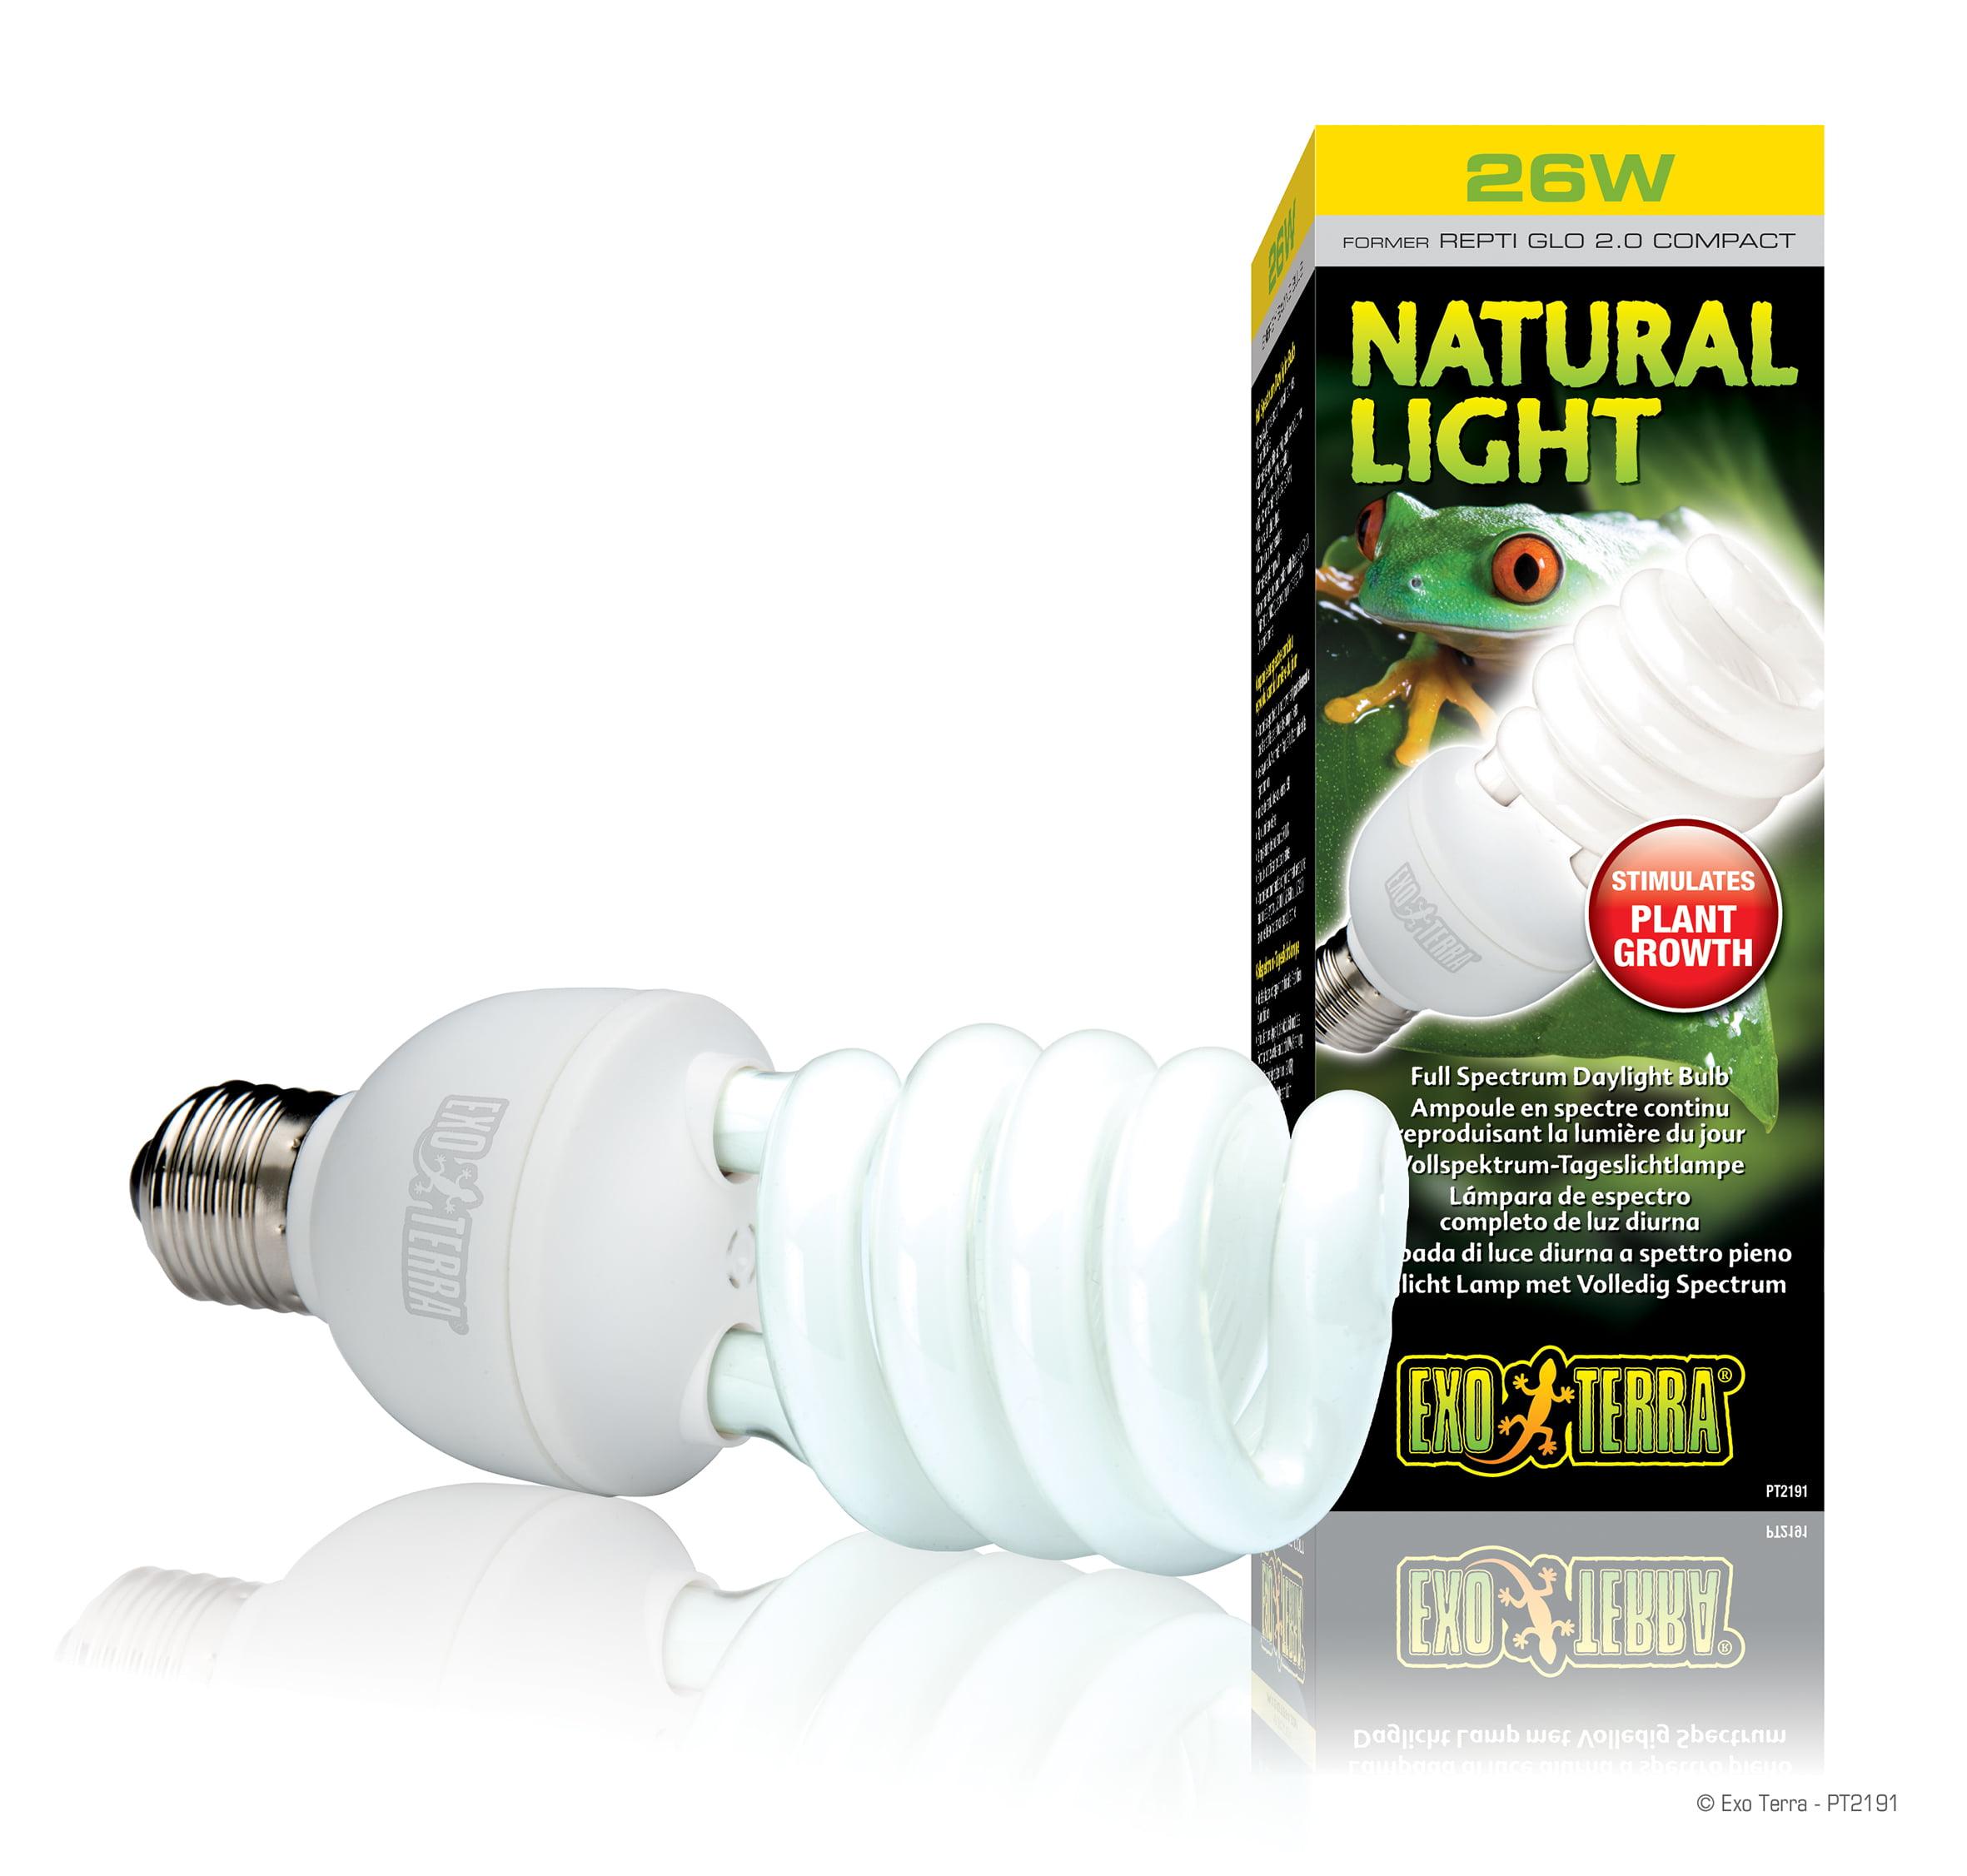 Ex Natural Light Volspectrumlamp 26w